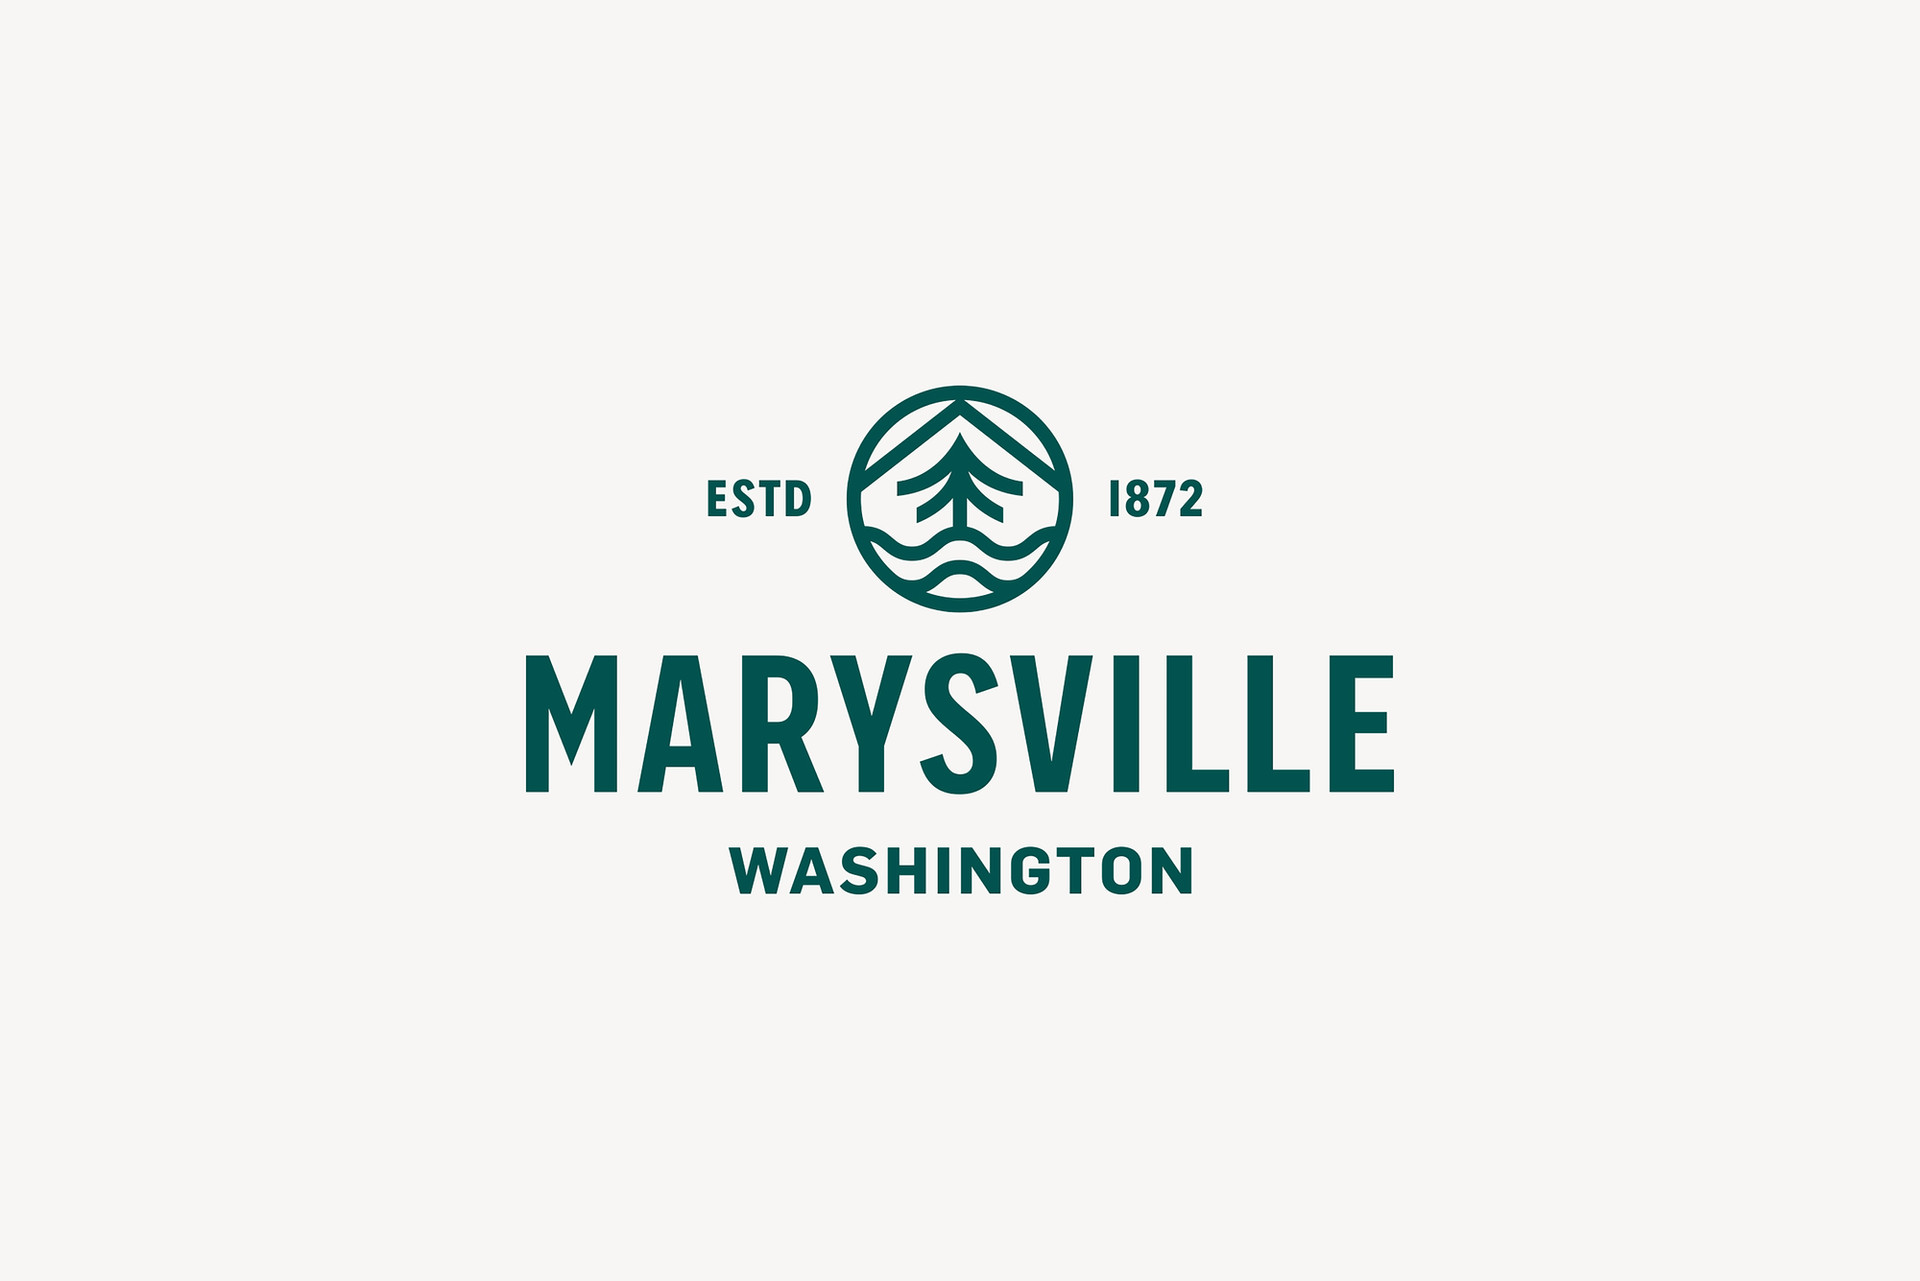 Marysville_1.jpg